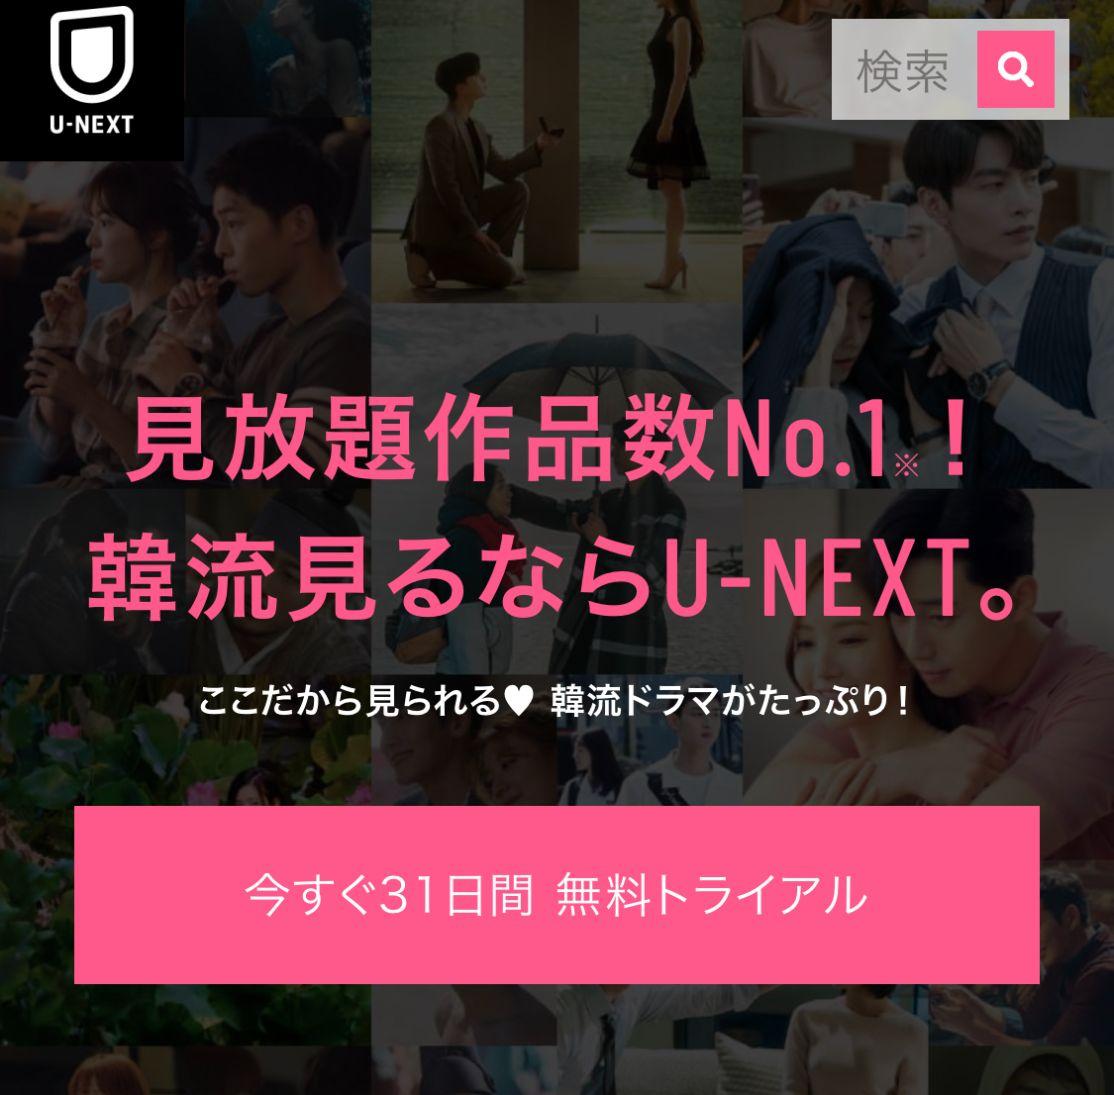 U-NEXT 韓国語